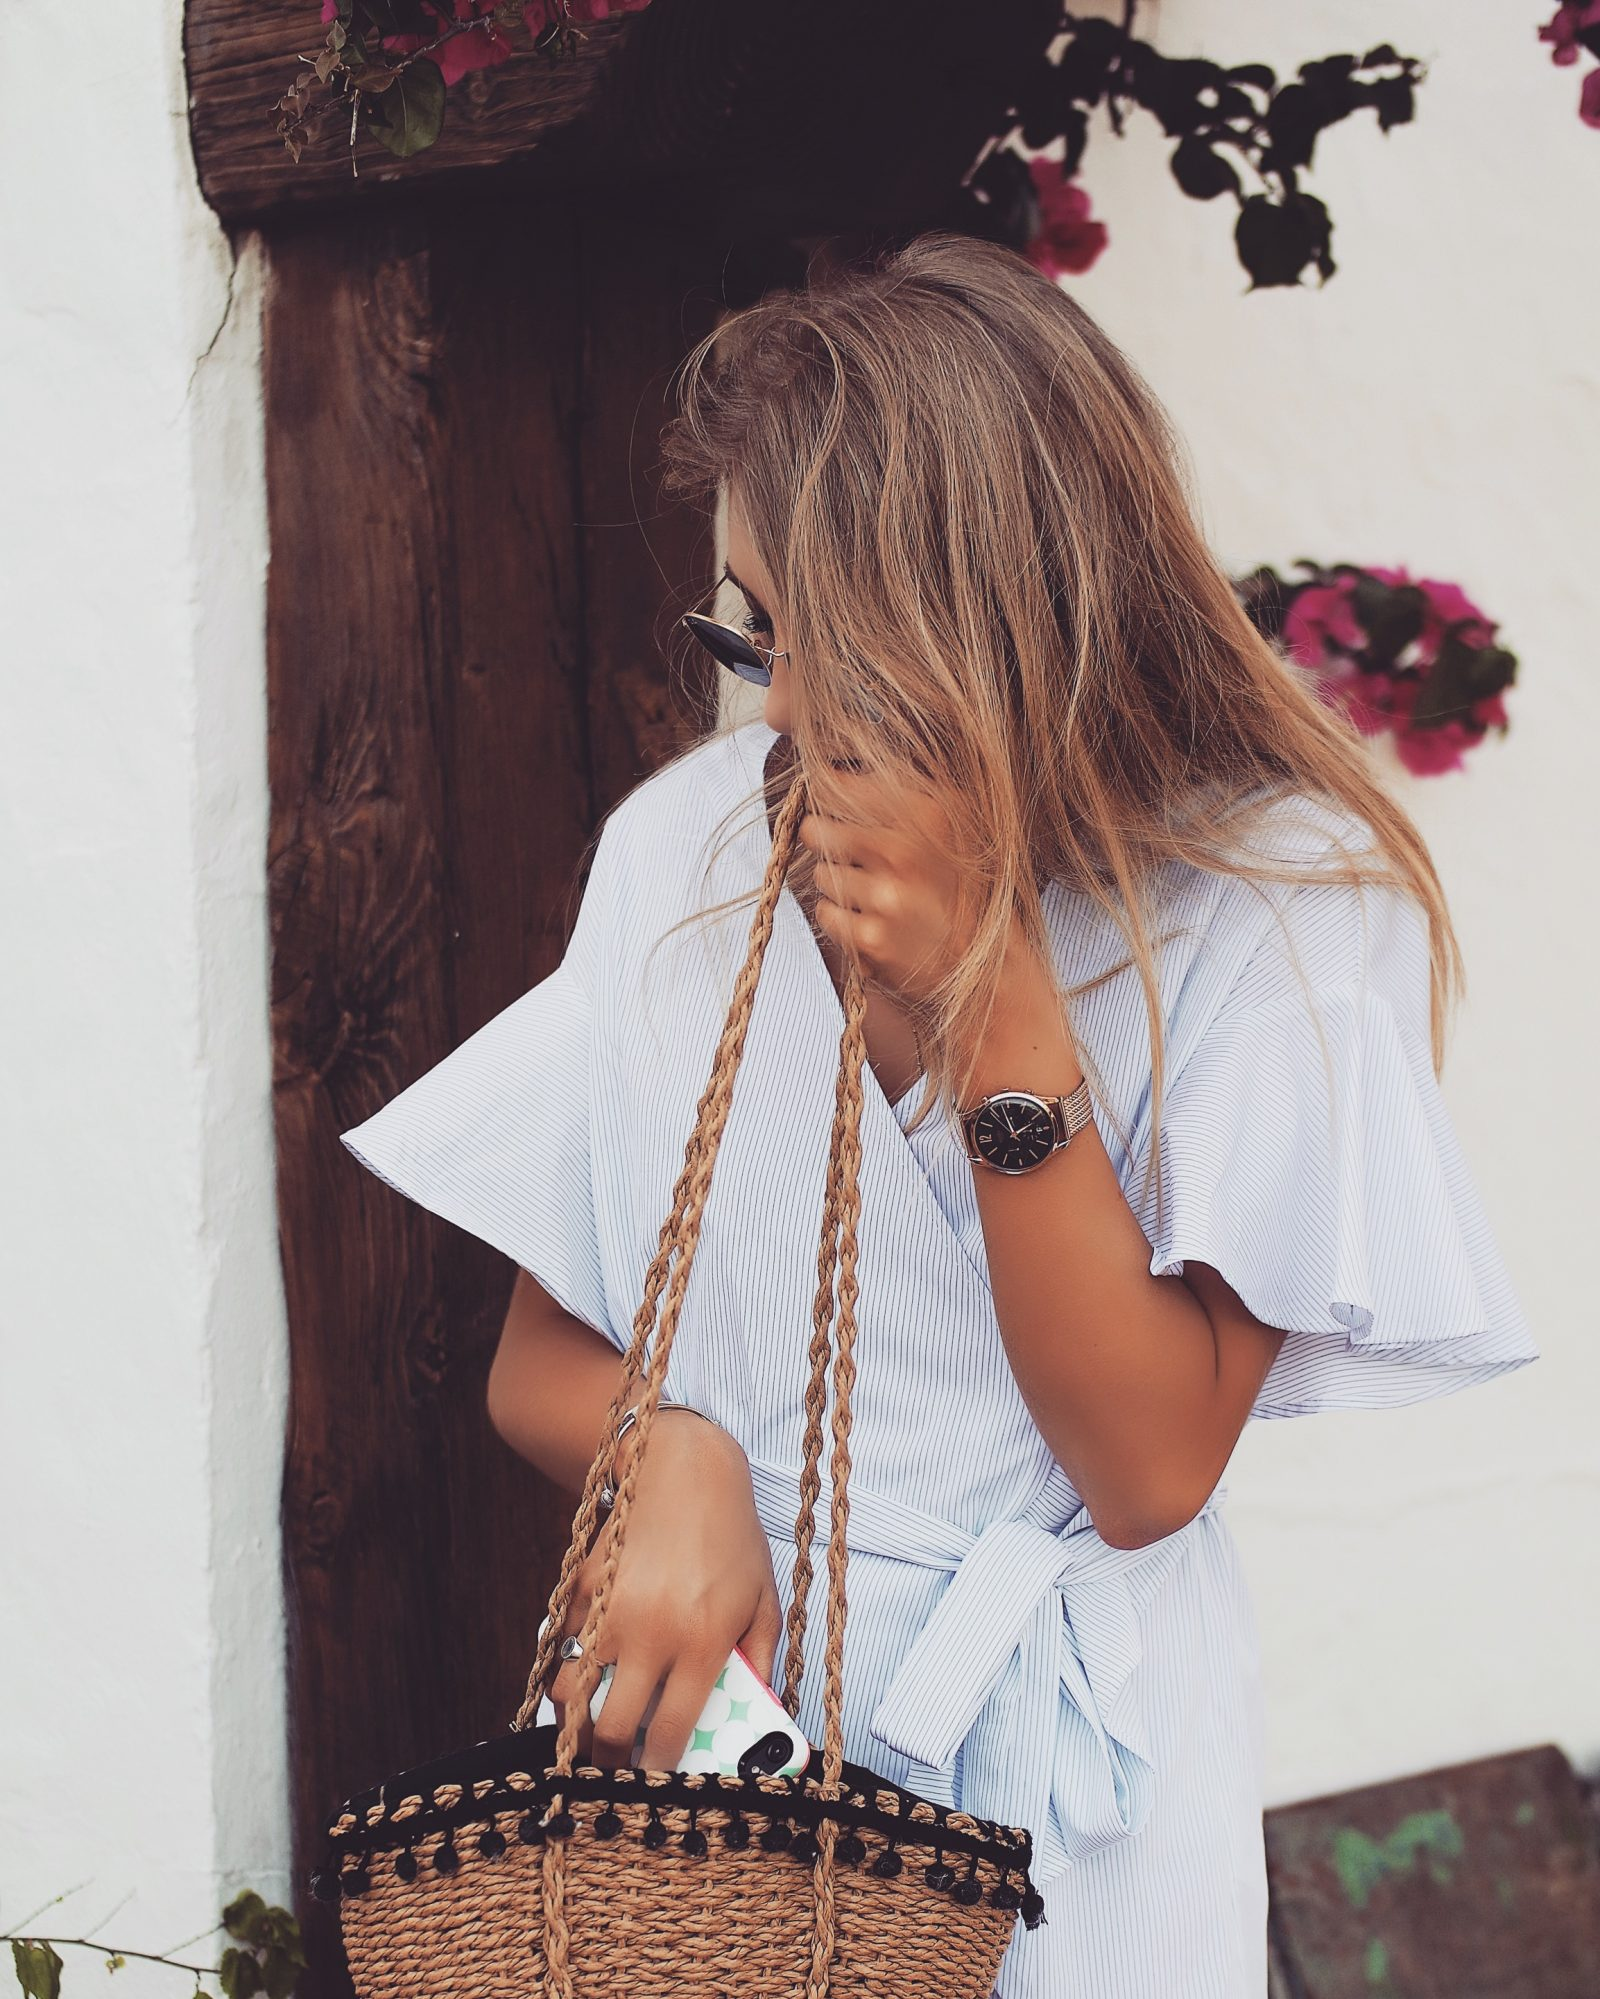 Topshop Dress - Zara Basket Bag